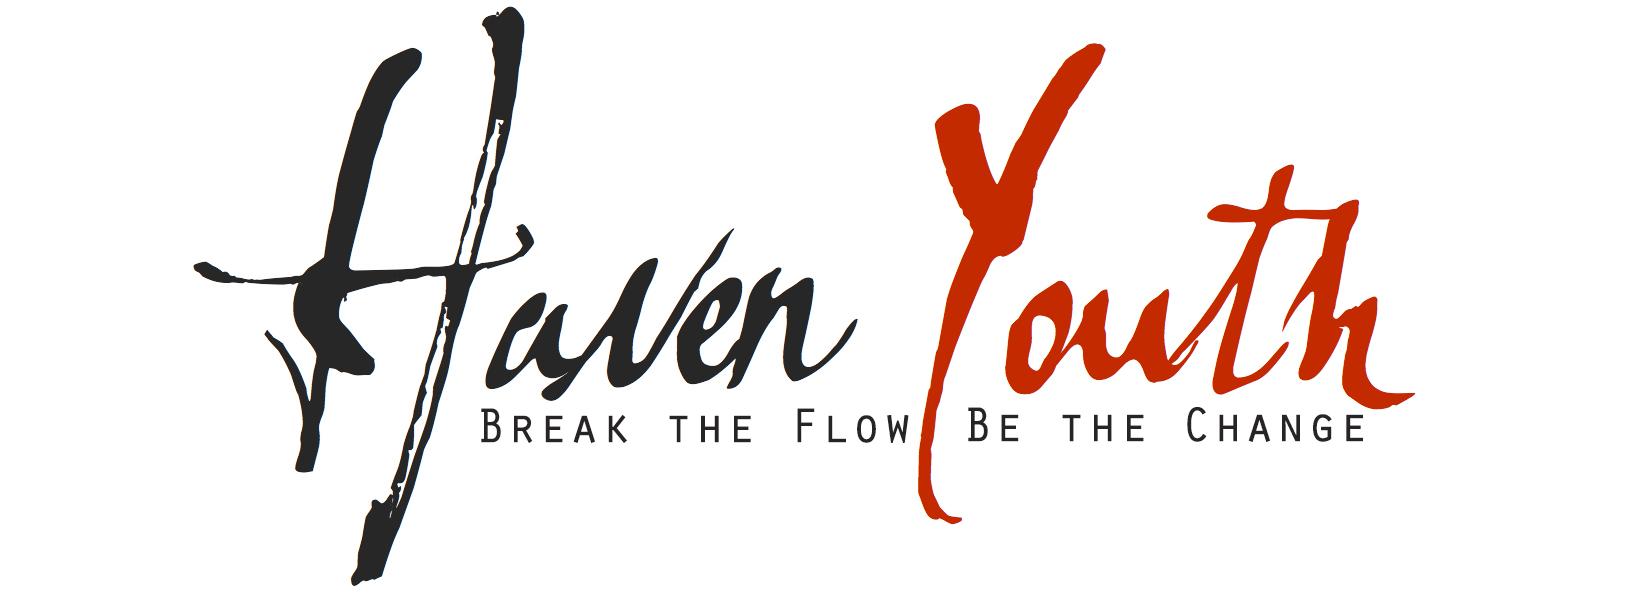 Haven-logo-break-the-flow-1.jpg